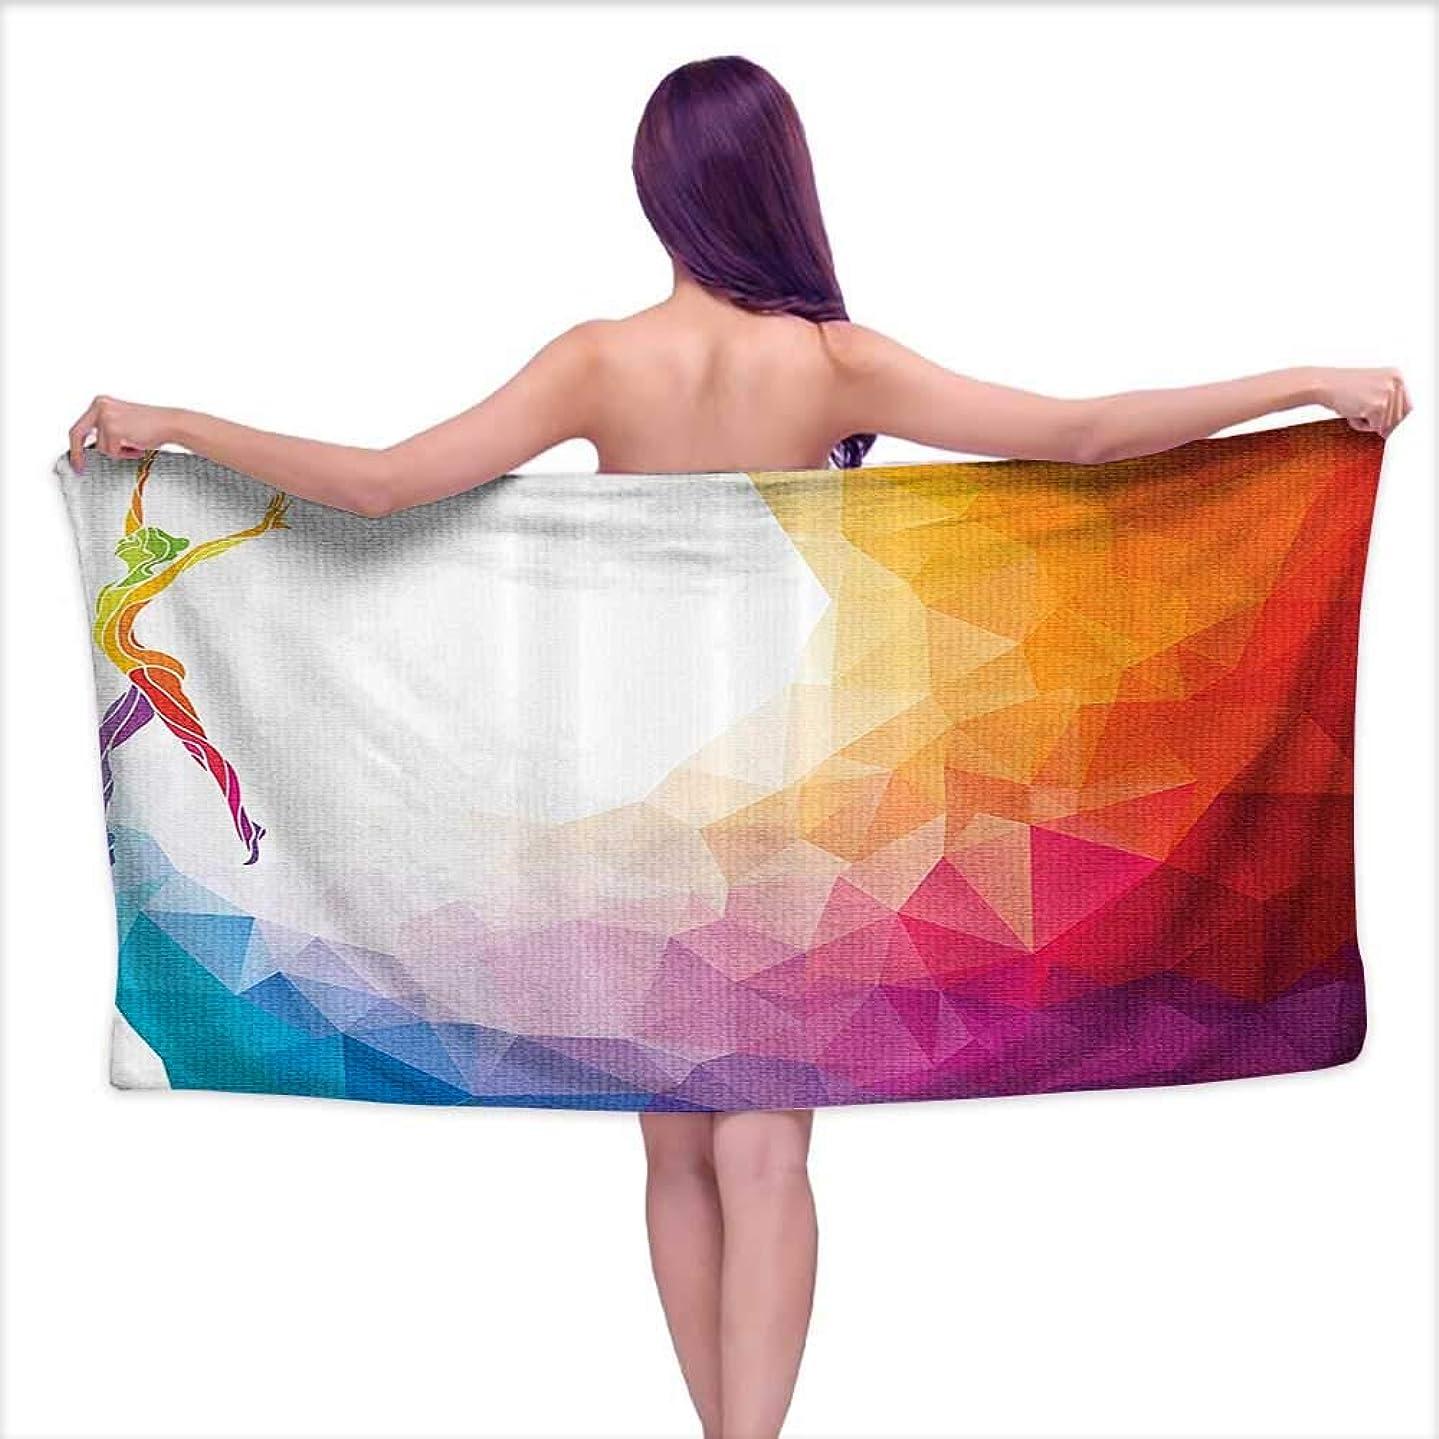 Beach Towel for Kids,Gymnastics Girl Body Gymnast Portrait Colored Digital Shapes Modern Olymp,Beach, Swimming, Bath, Camping, and Picnic W 20